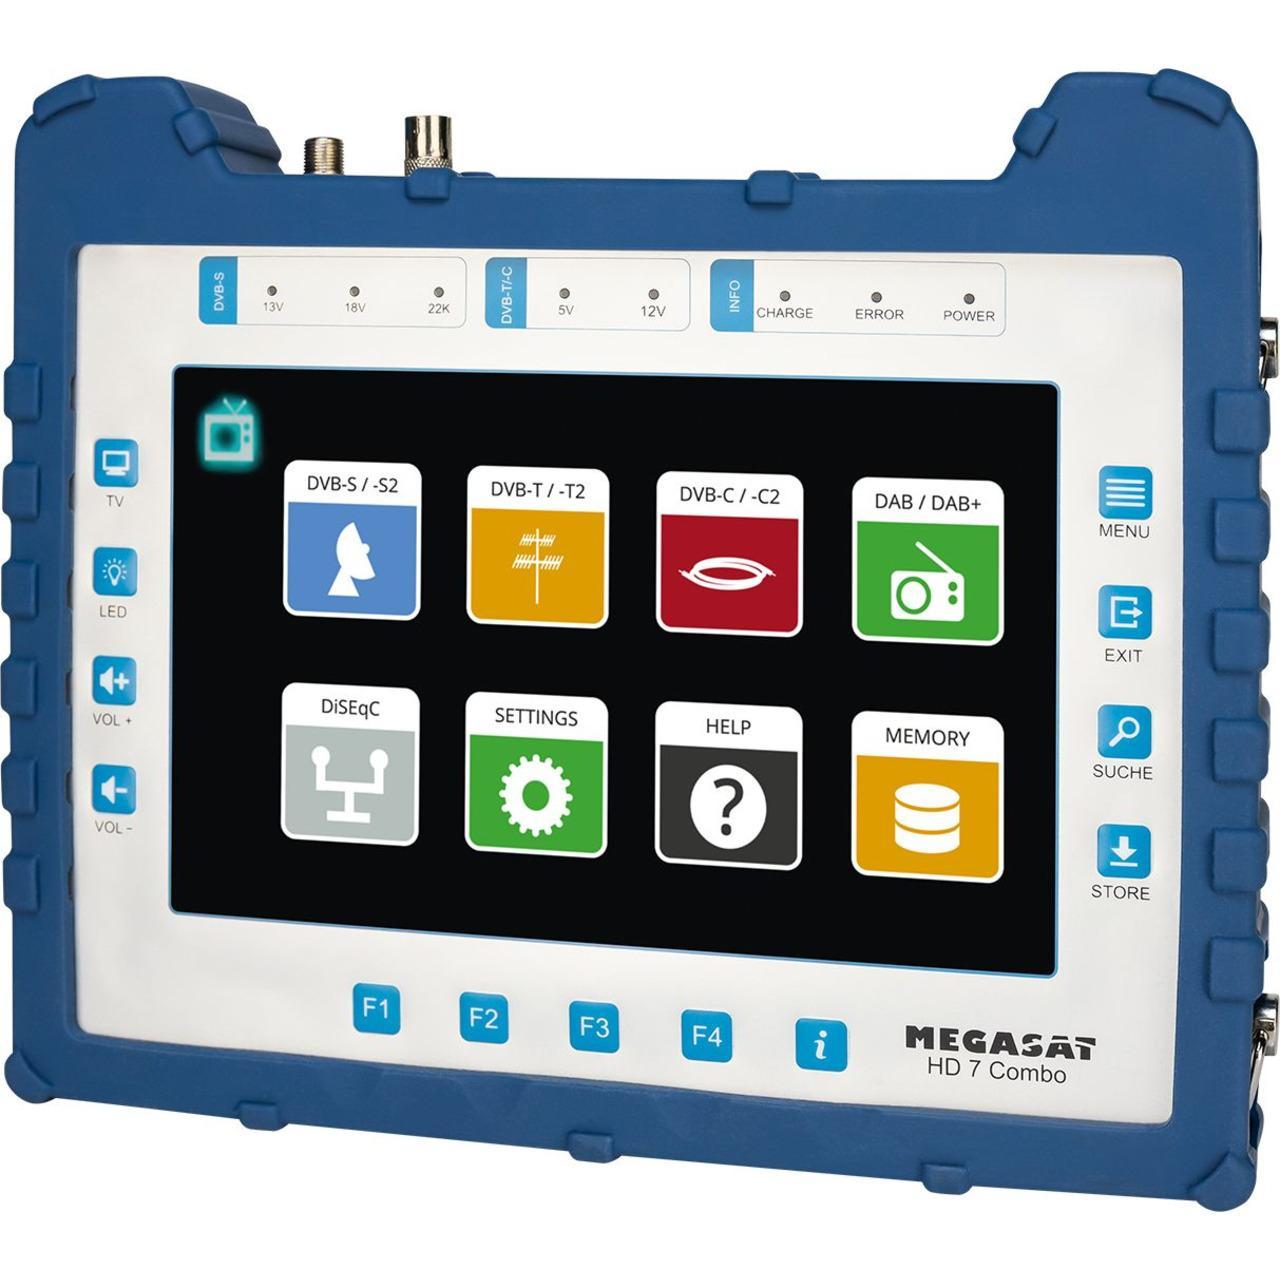 Megasat DVB-Combo-Messgerät HD 7 Combo, DVB-S/S2/T/T2/C/C2, DAB+, 22,6-cm-Touchdisplay (8,9